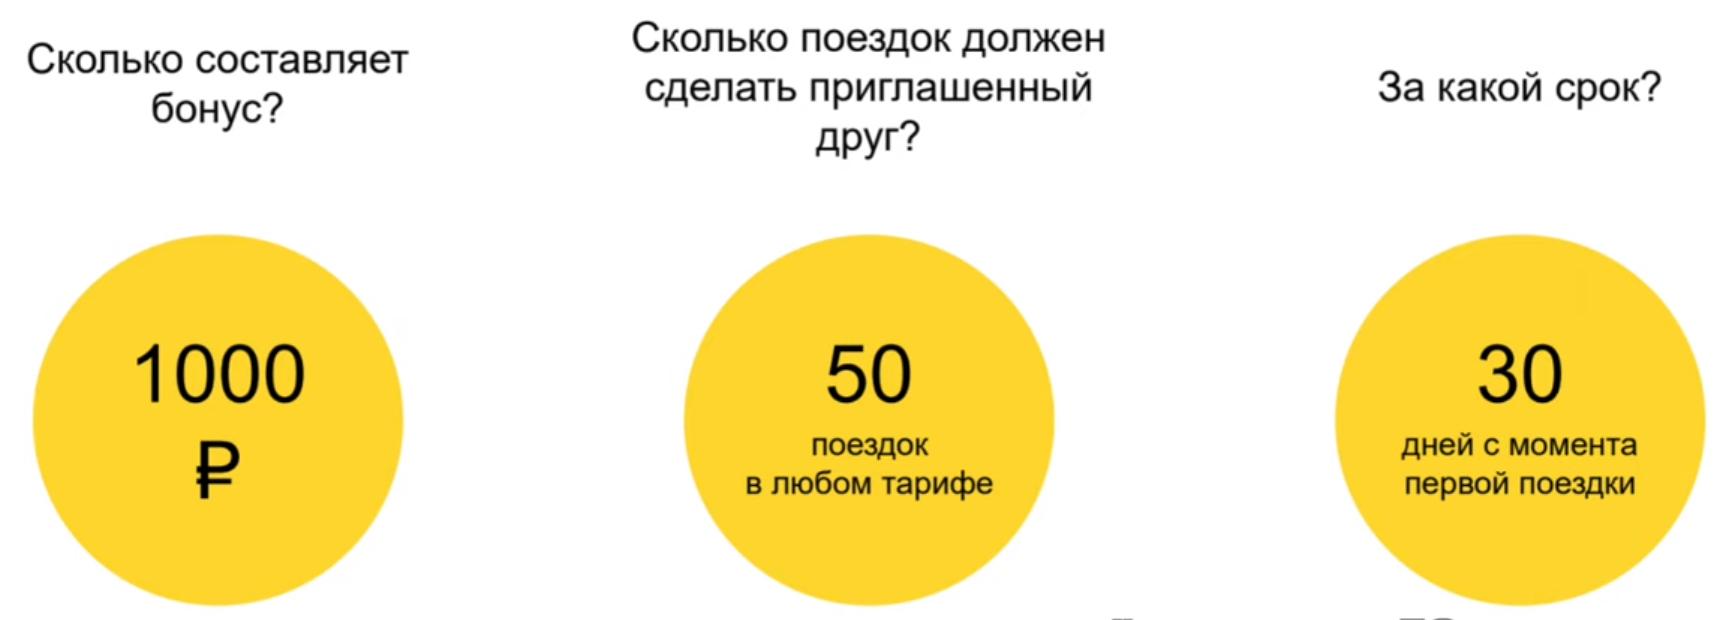 условия рекомендации друзей в Яндекс Такси